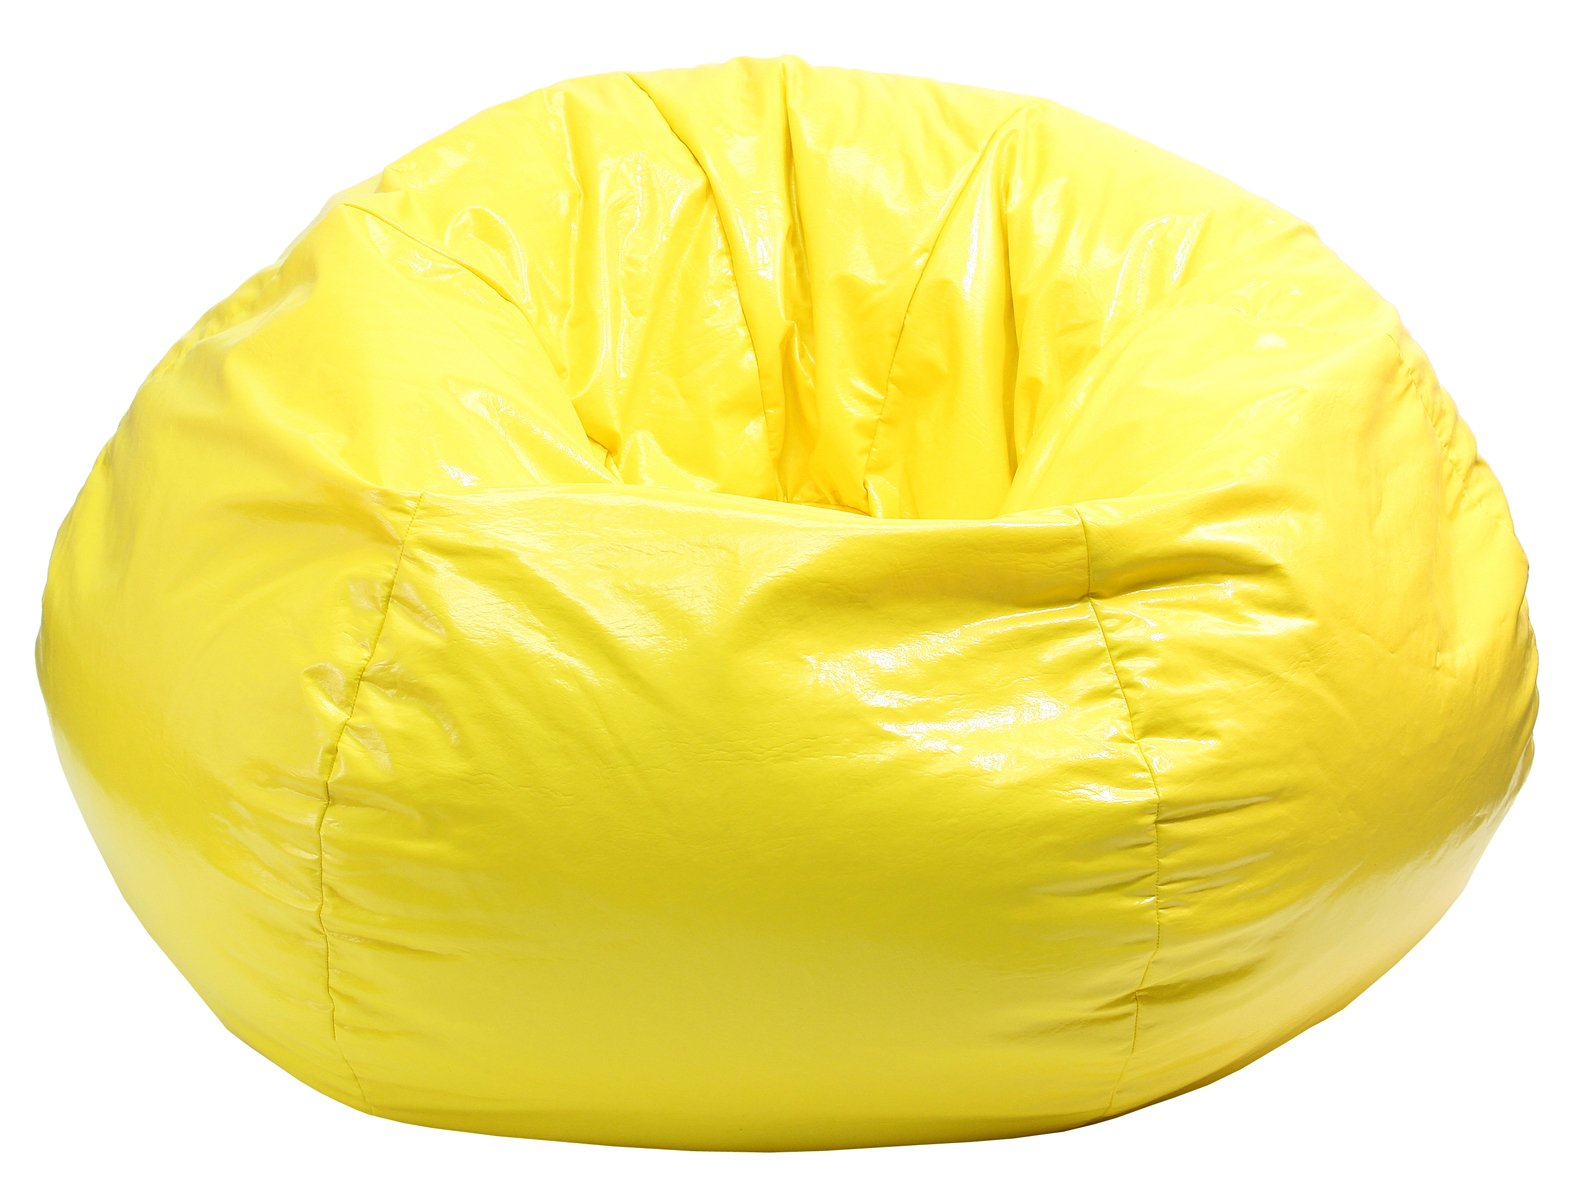 Gold Medal Bean Bags Wet Look Vinyl Bean Bag, XX-Large, Yellow